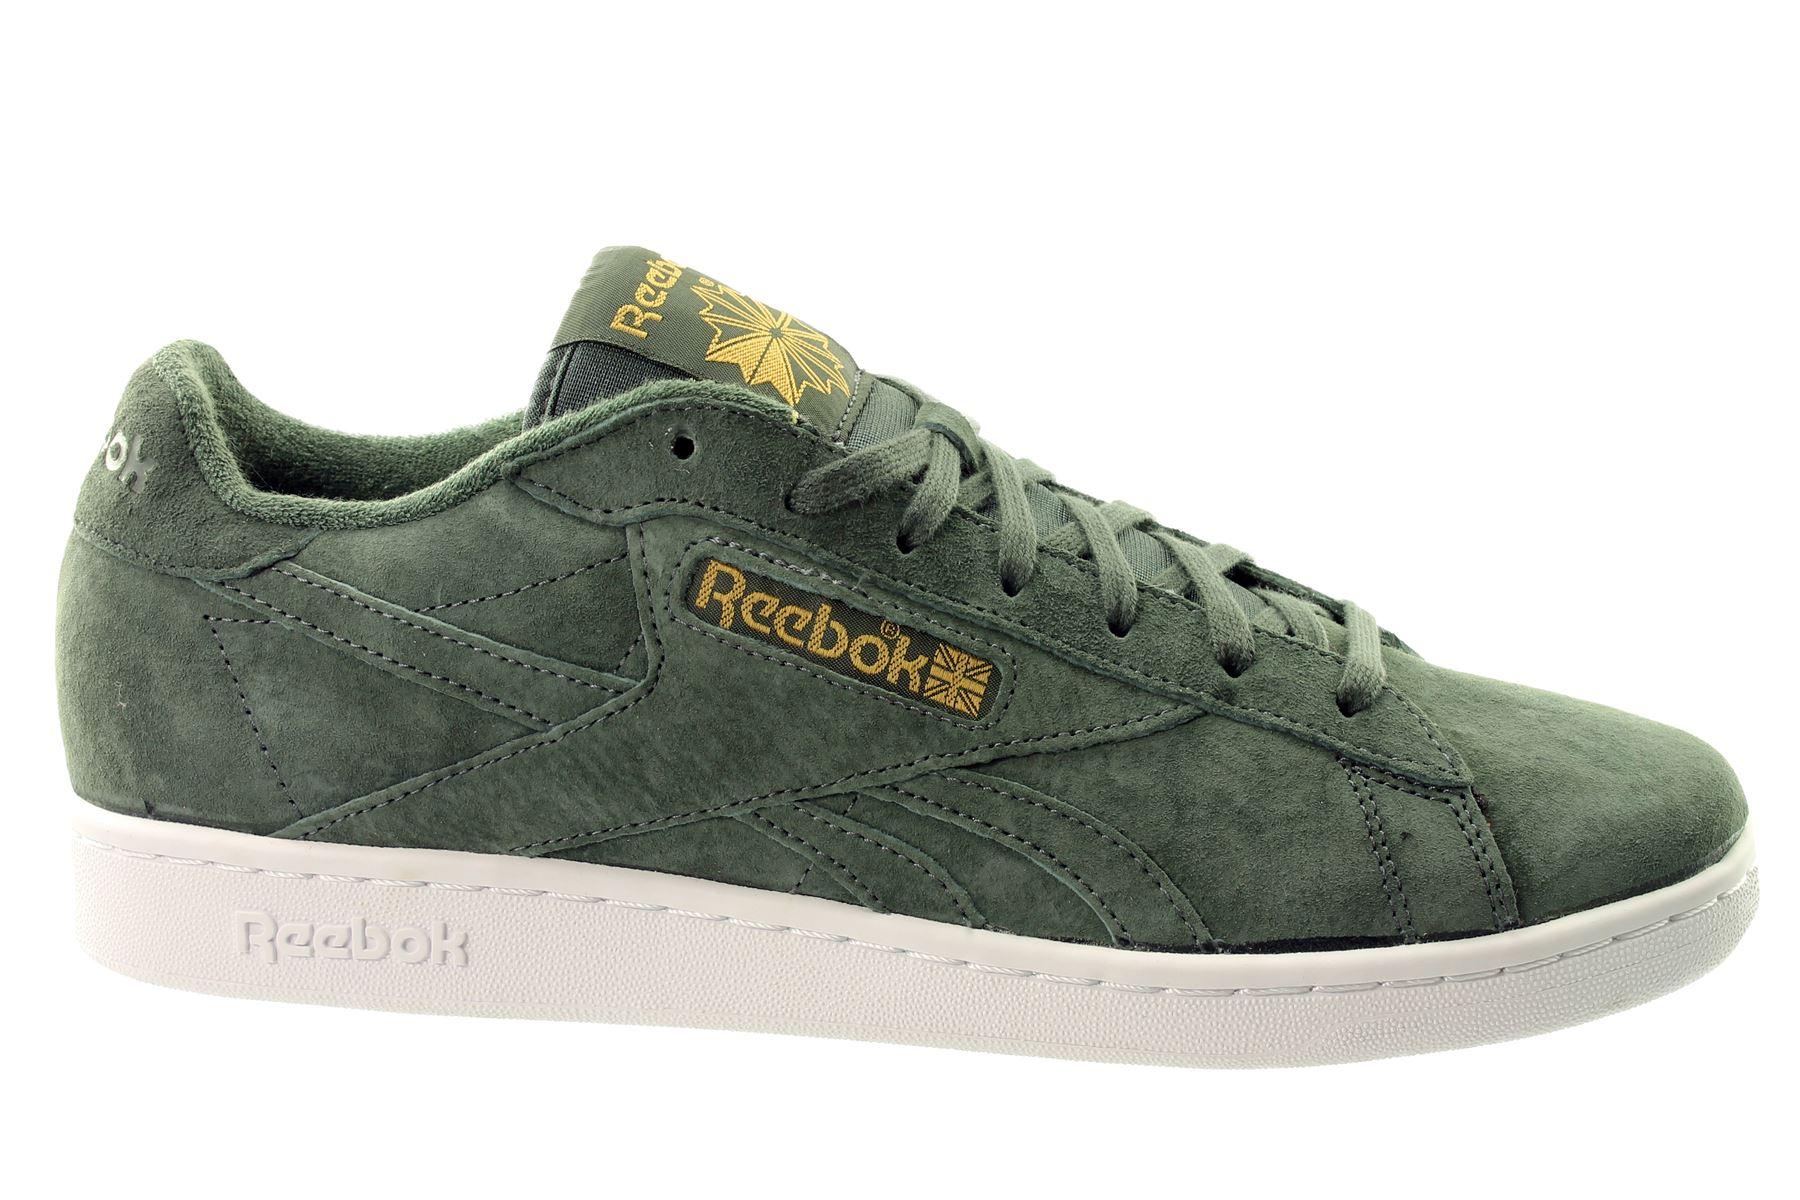 reebok npc uk green sneakers 676cc854a